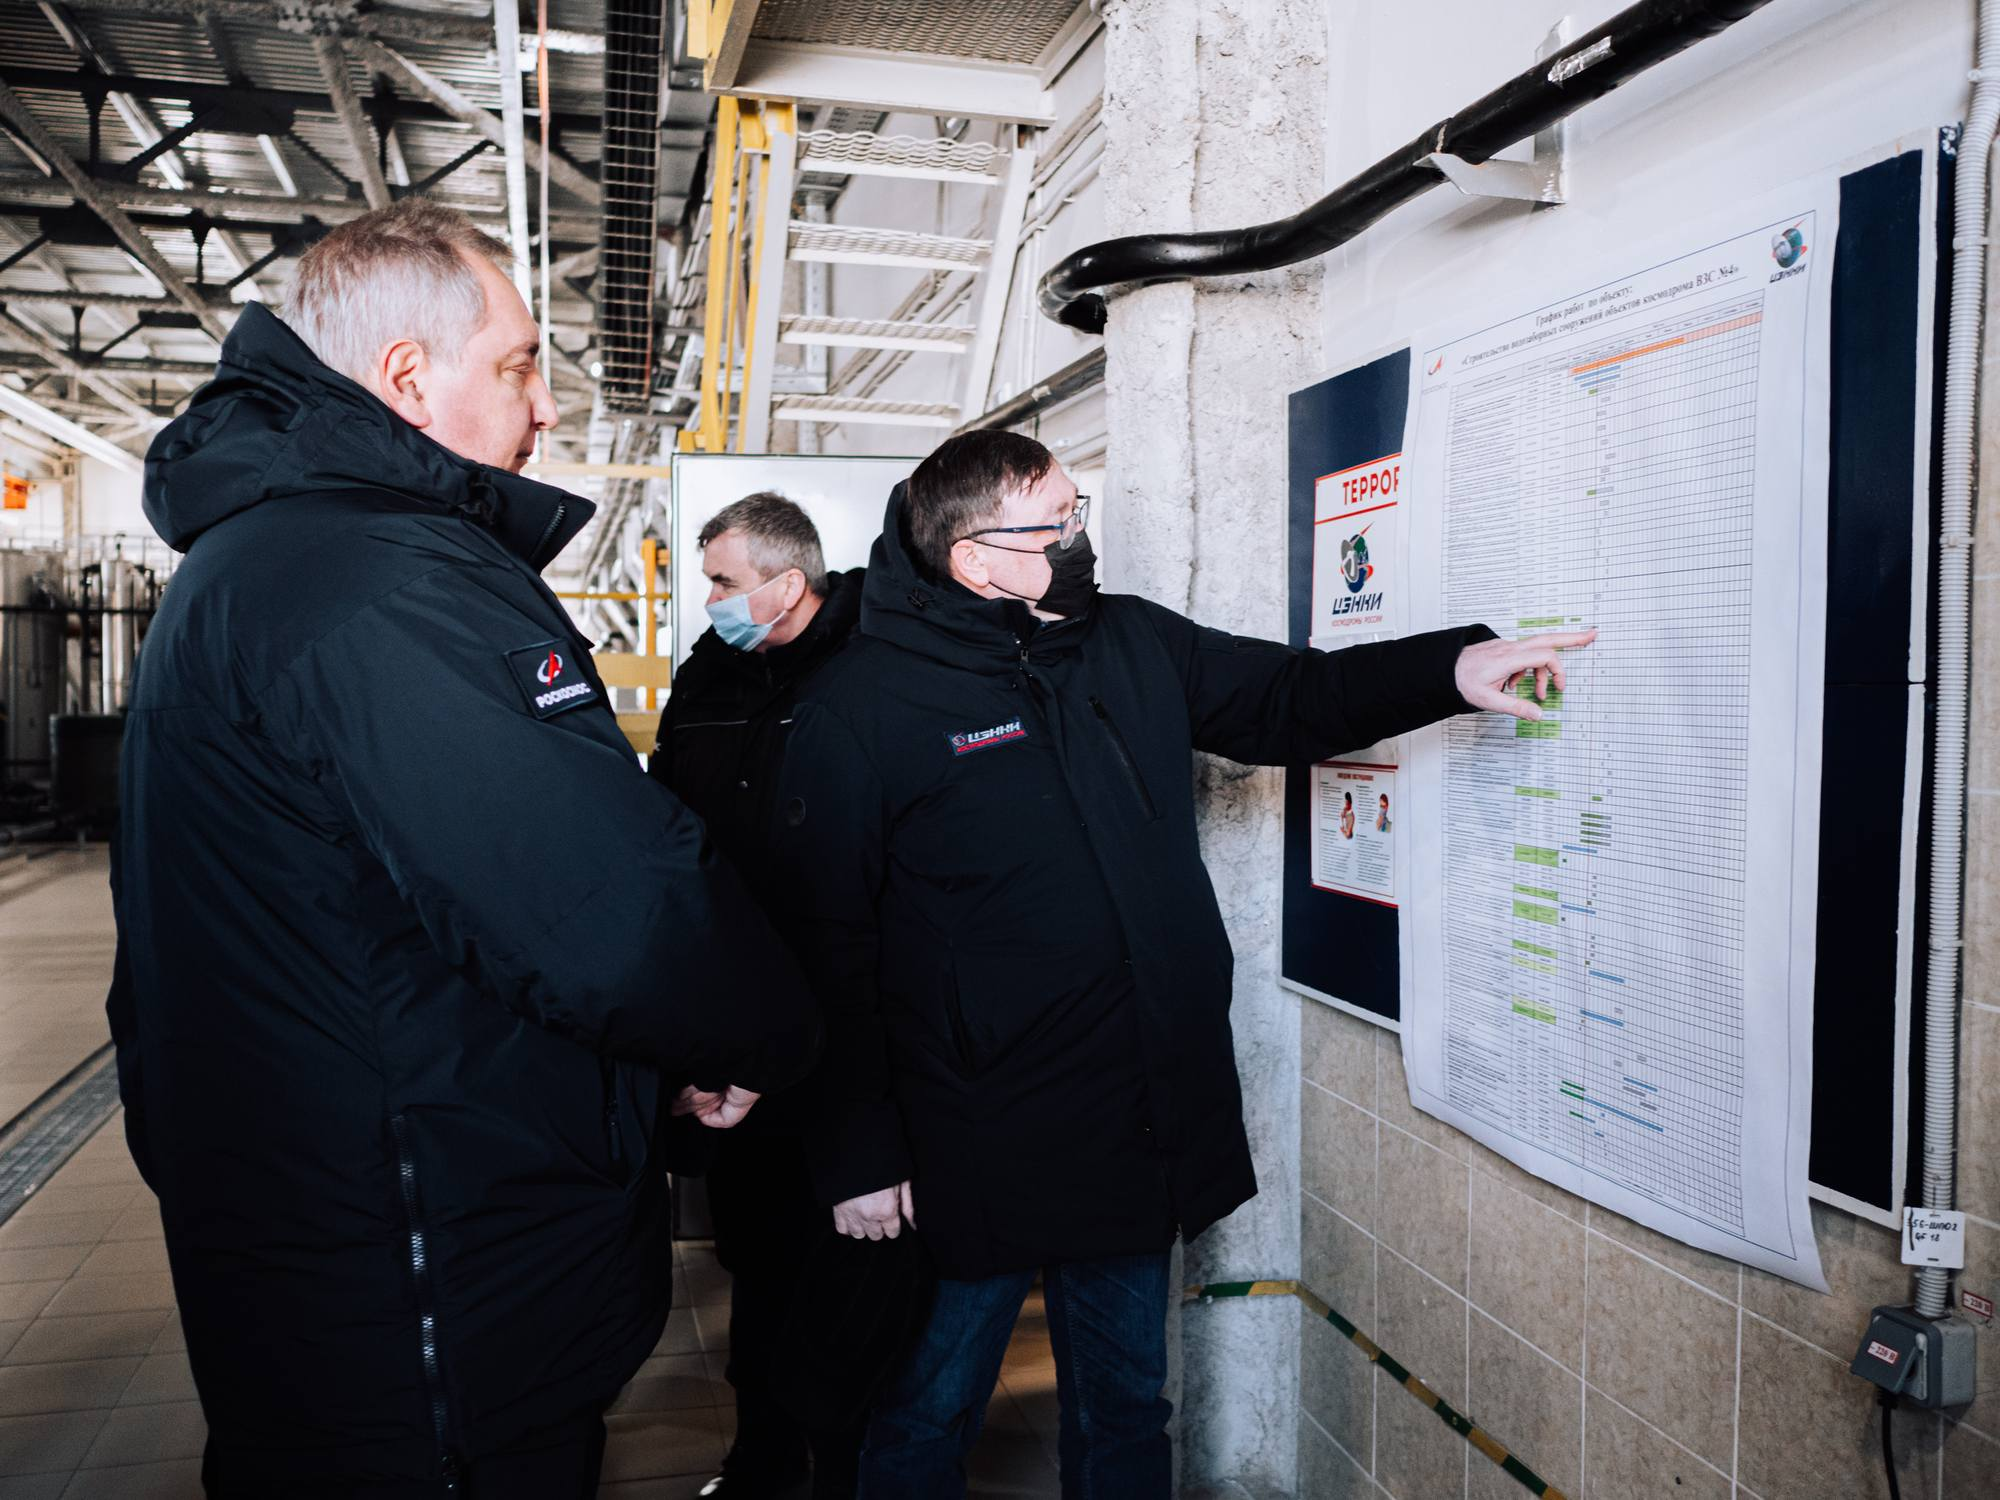 Le DG du TsENKI, Rouslan Makhoumedzhanov montre à Dmitry Rogozine le planning de cosntruction.